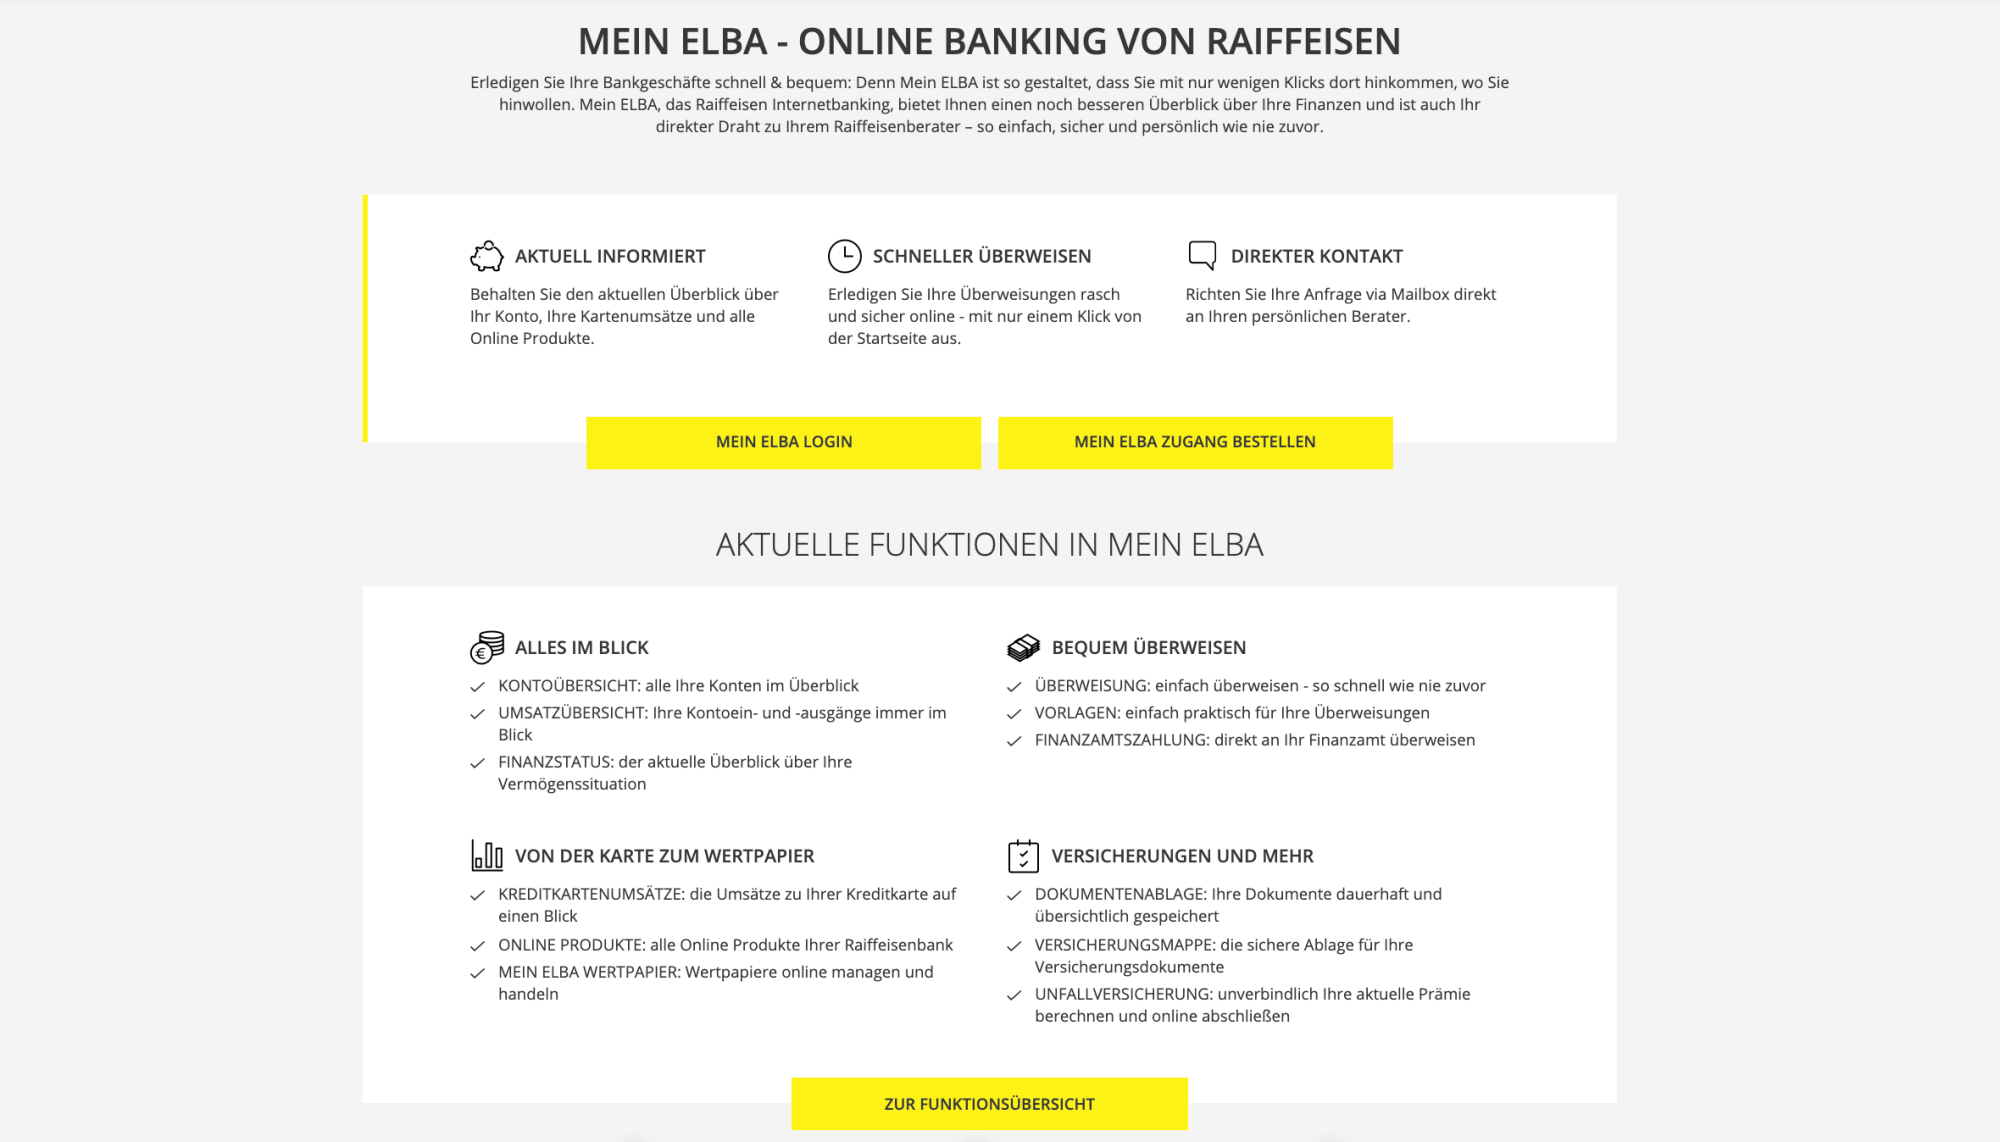 Ueberblick Infos